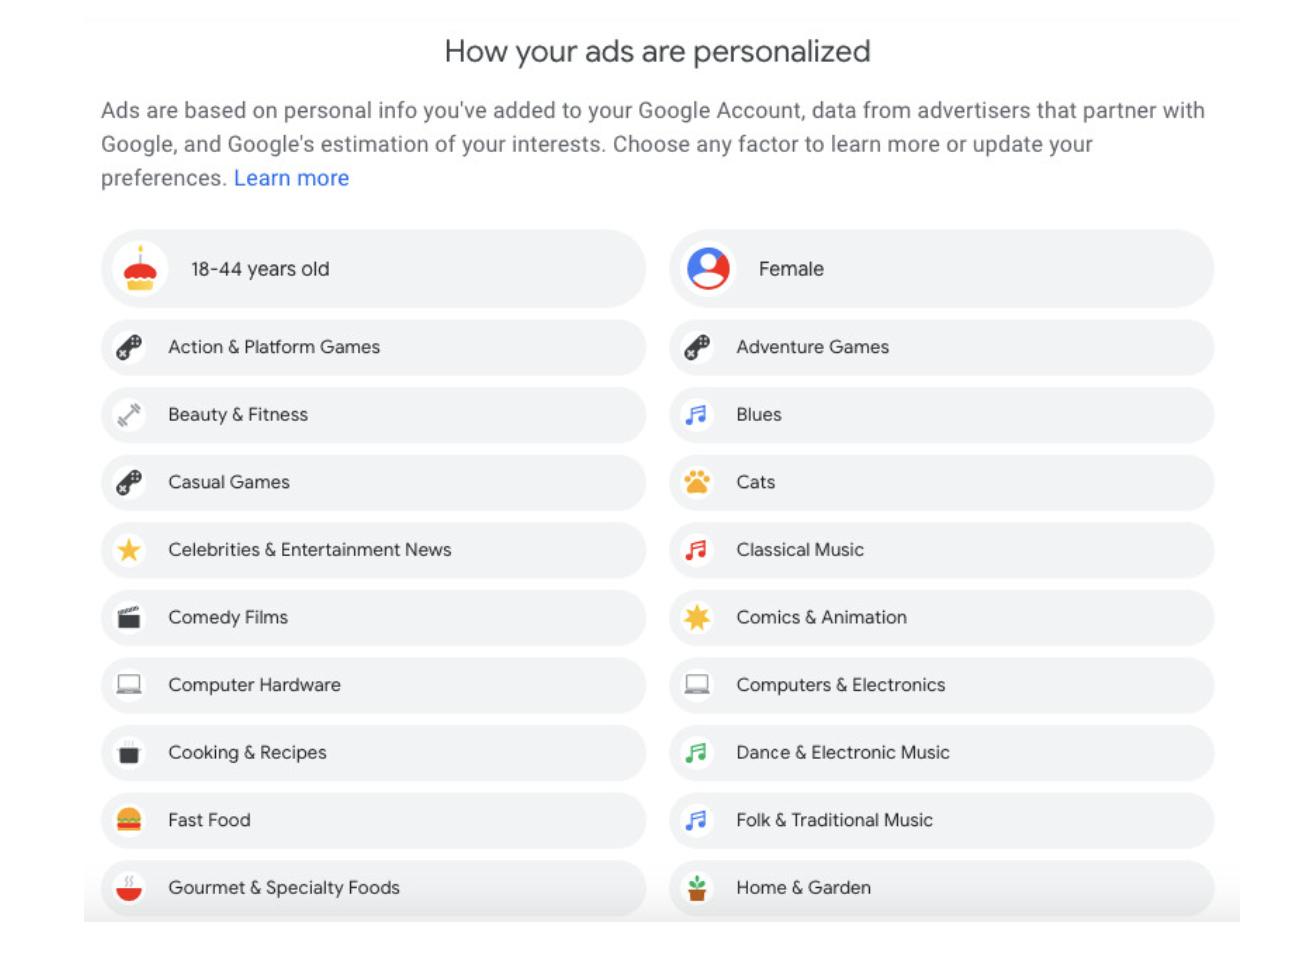 Google Ad behavioural targeting preferences